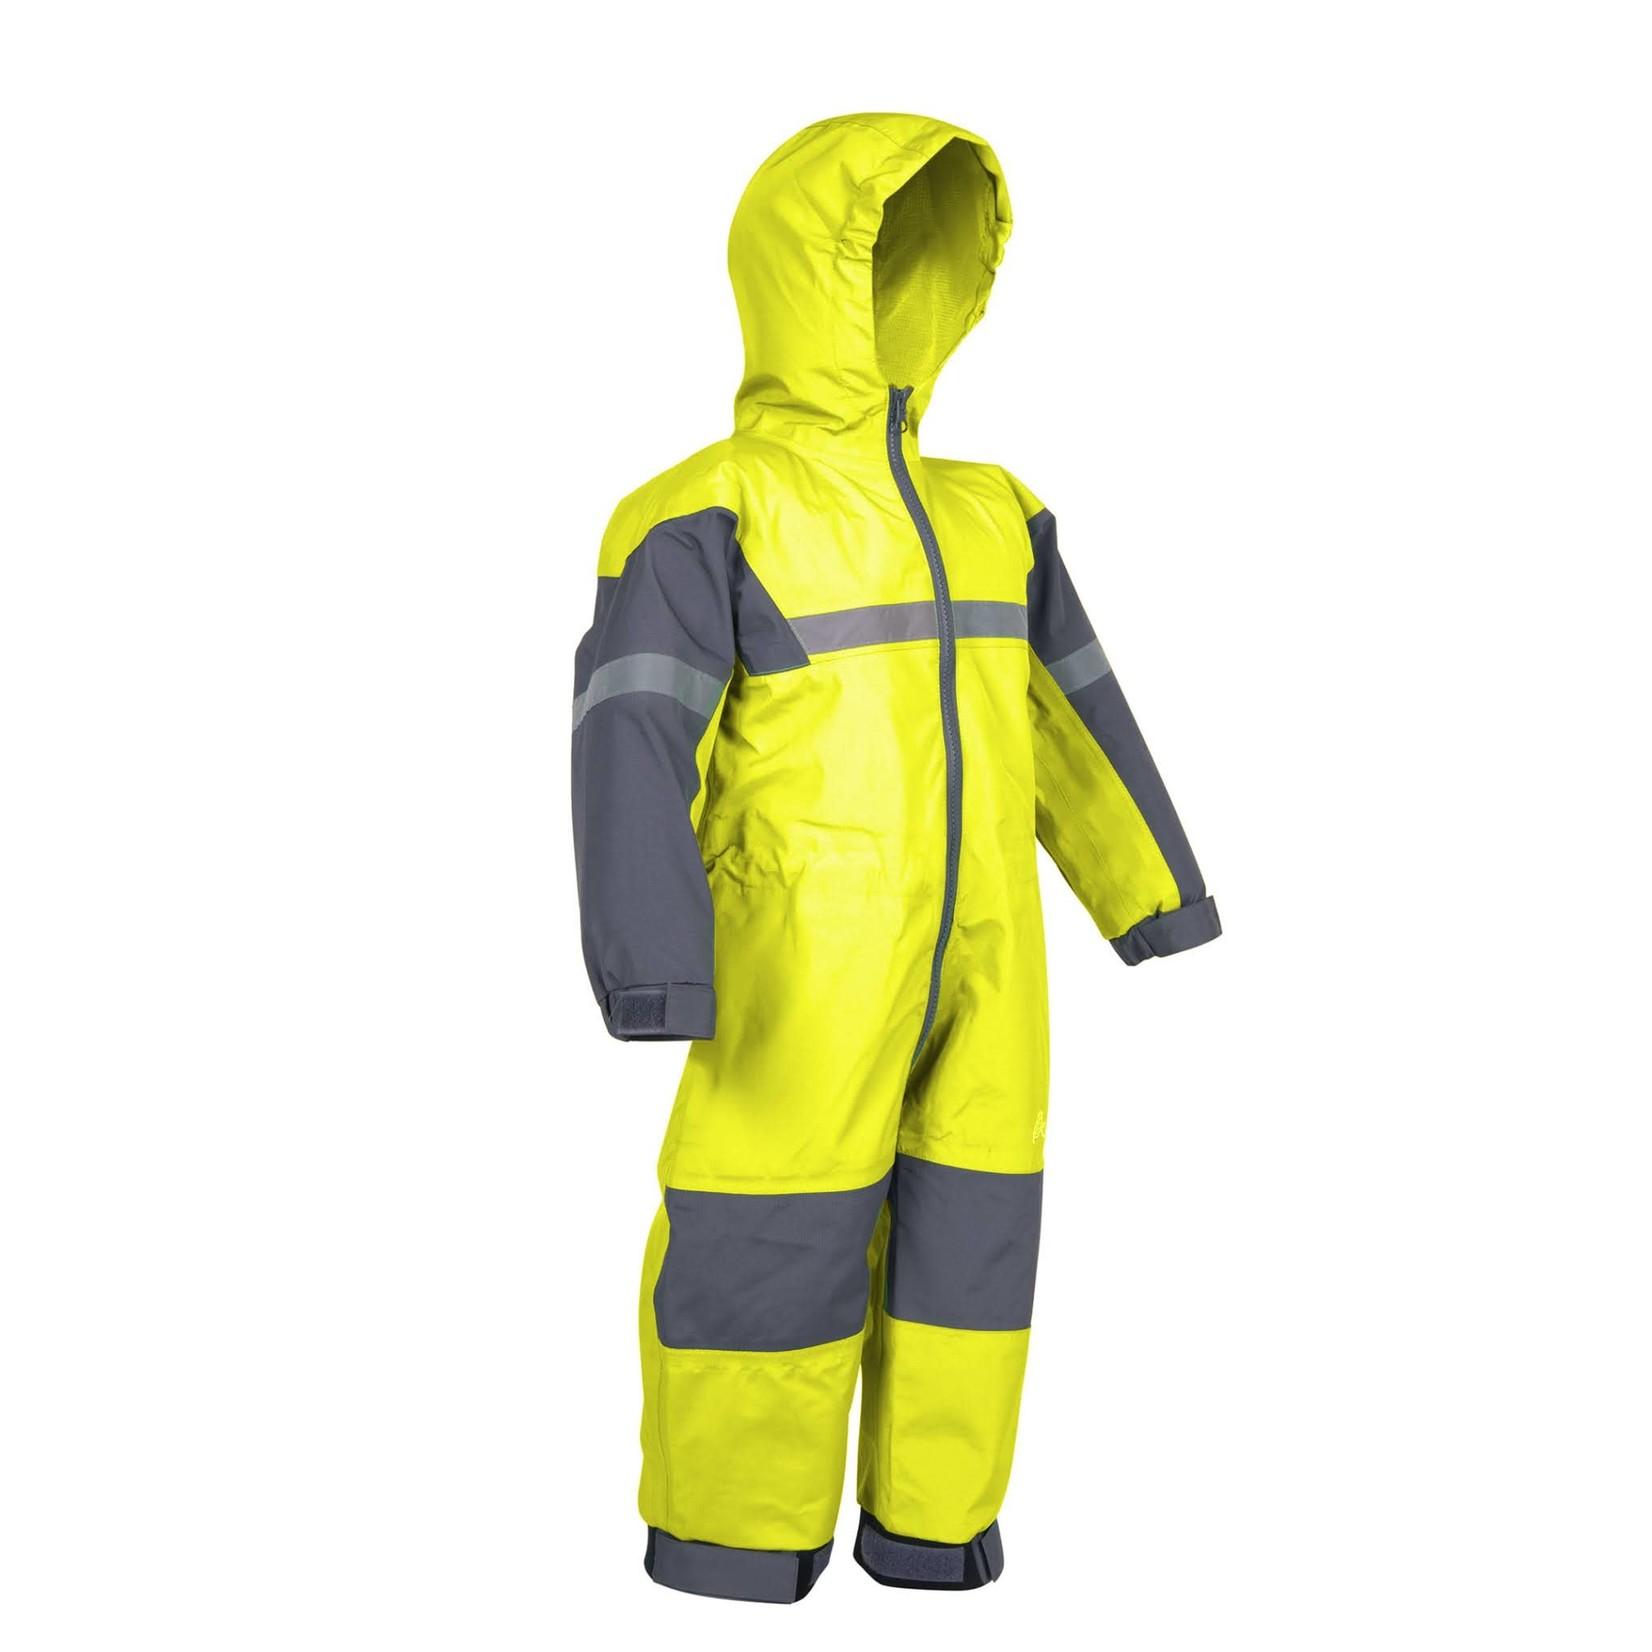 Oaki Wear Oaki Trail Rain Suit